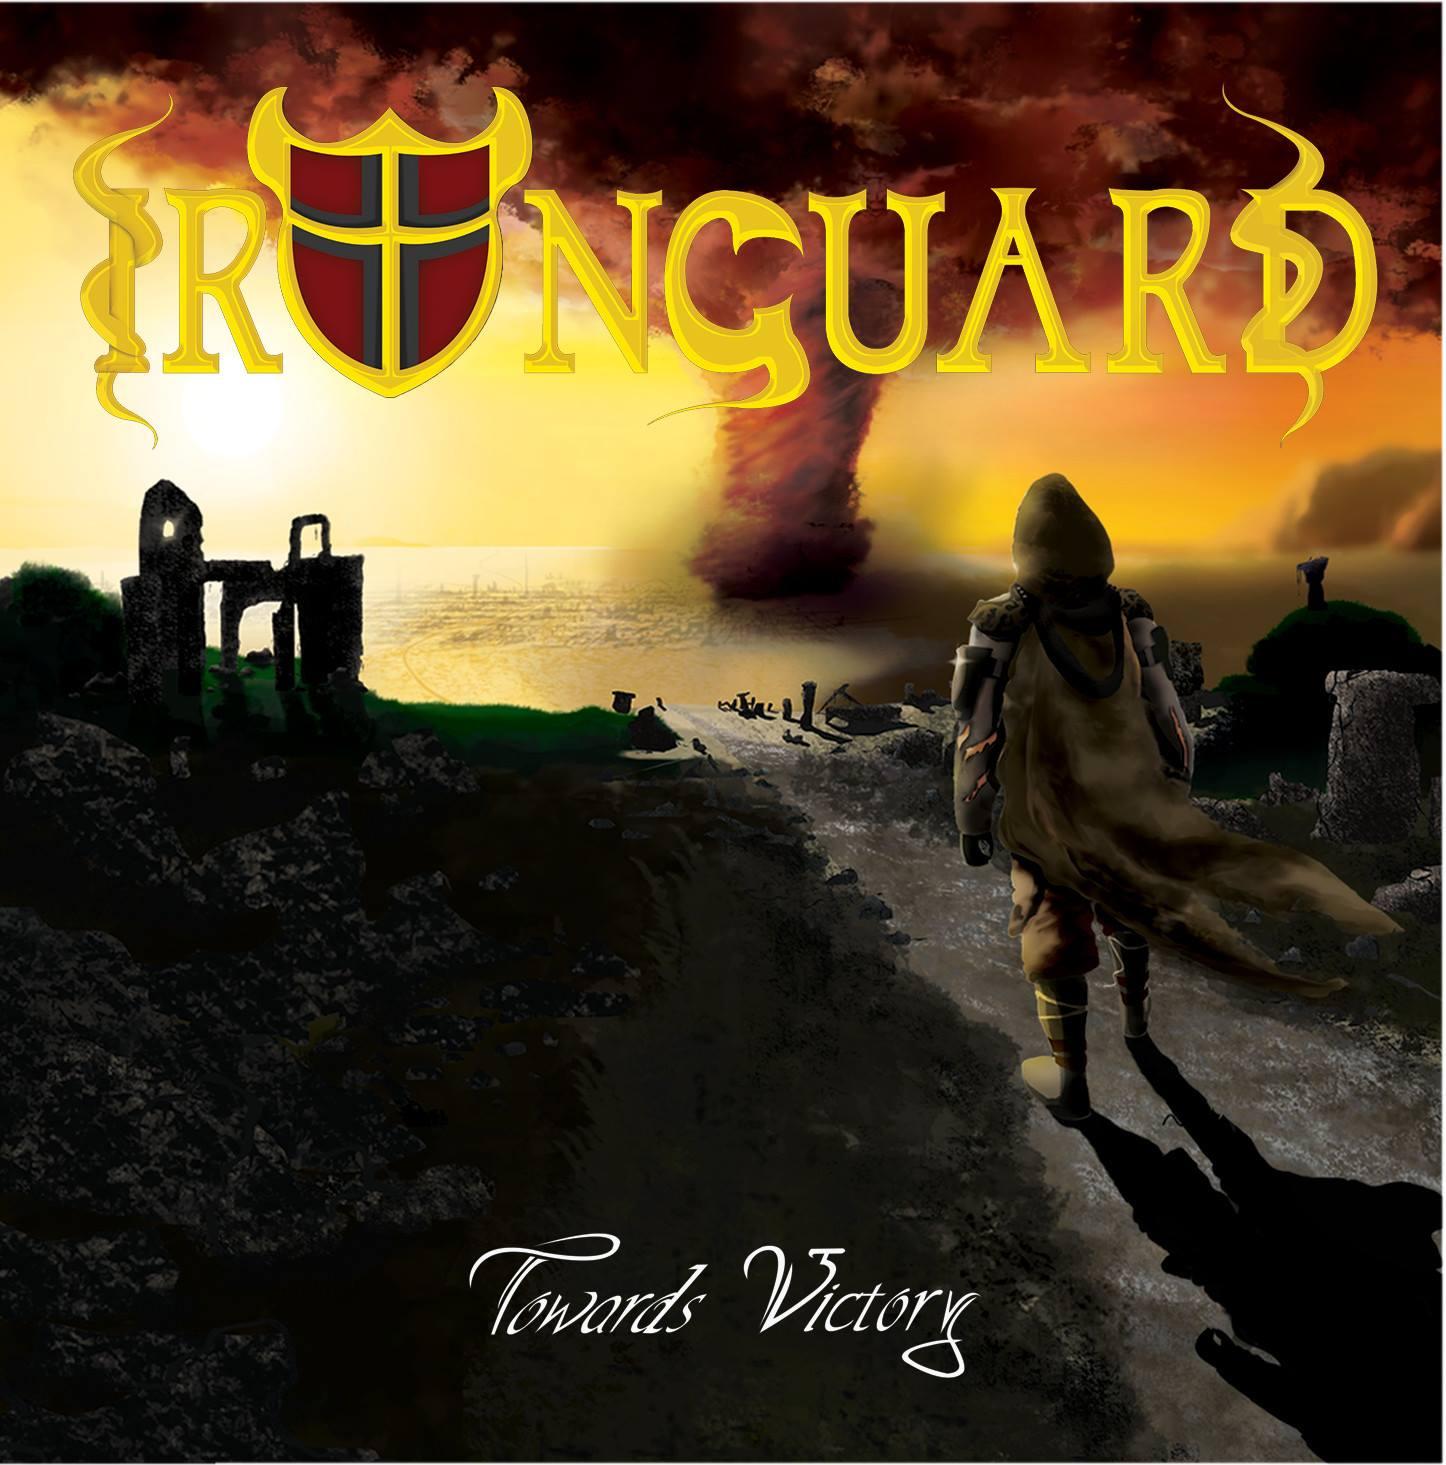 ironguard-towards-victory-auf-dem-weg-zum-sieg-album-review